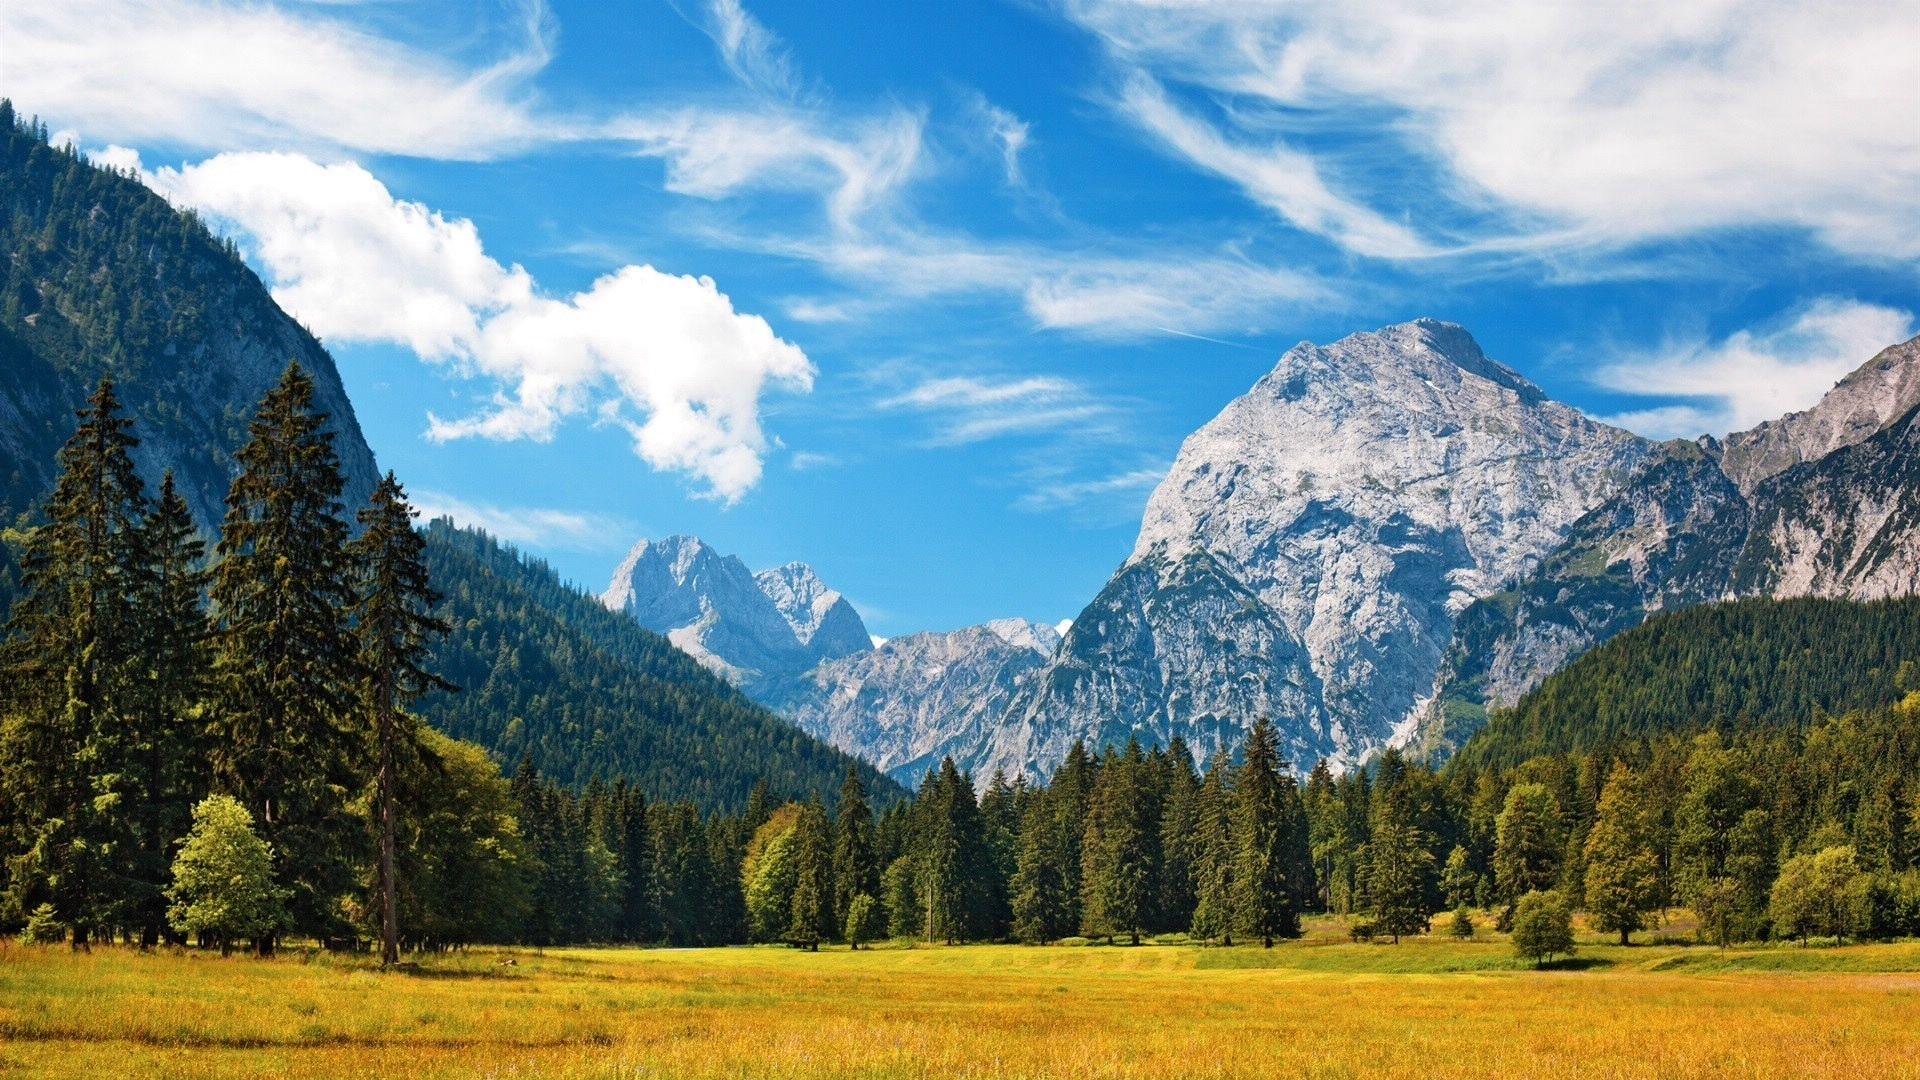 Landscape Mountain Forest